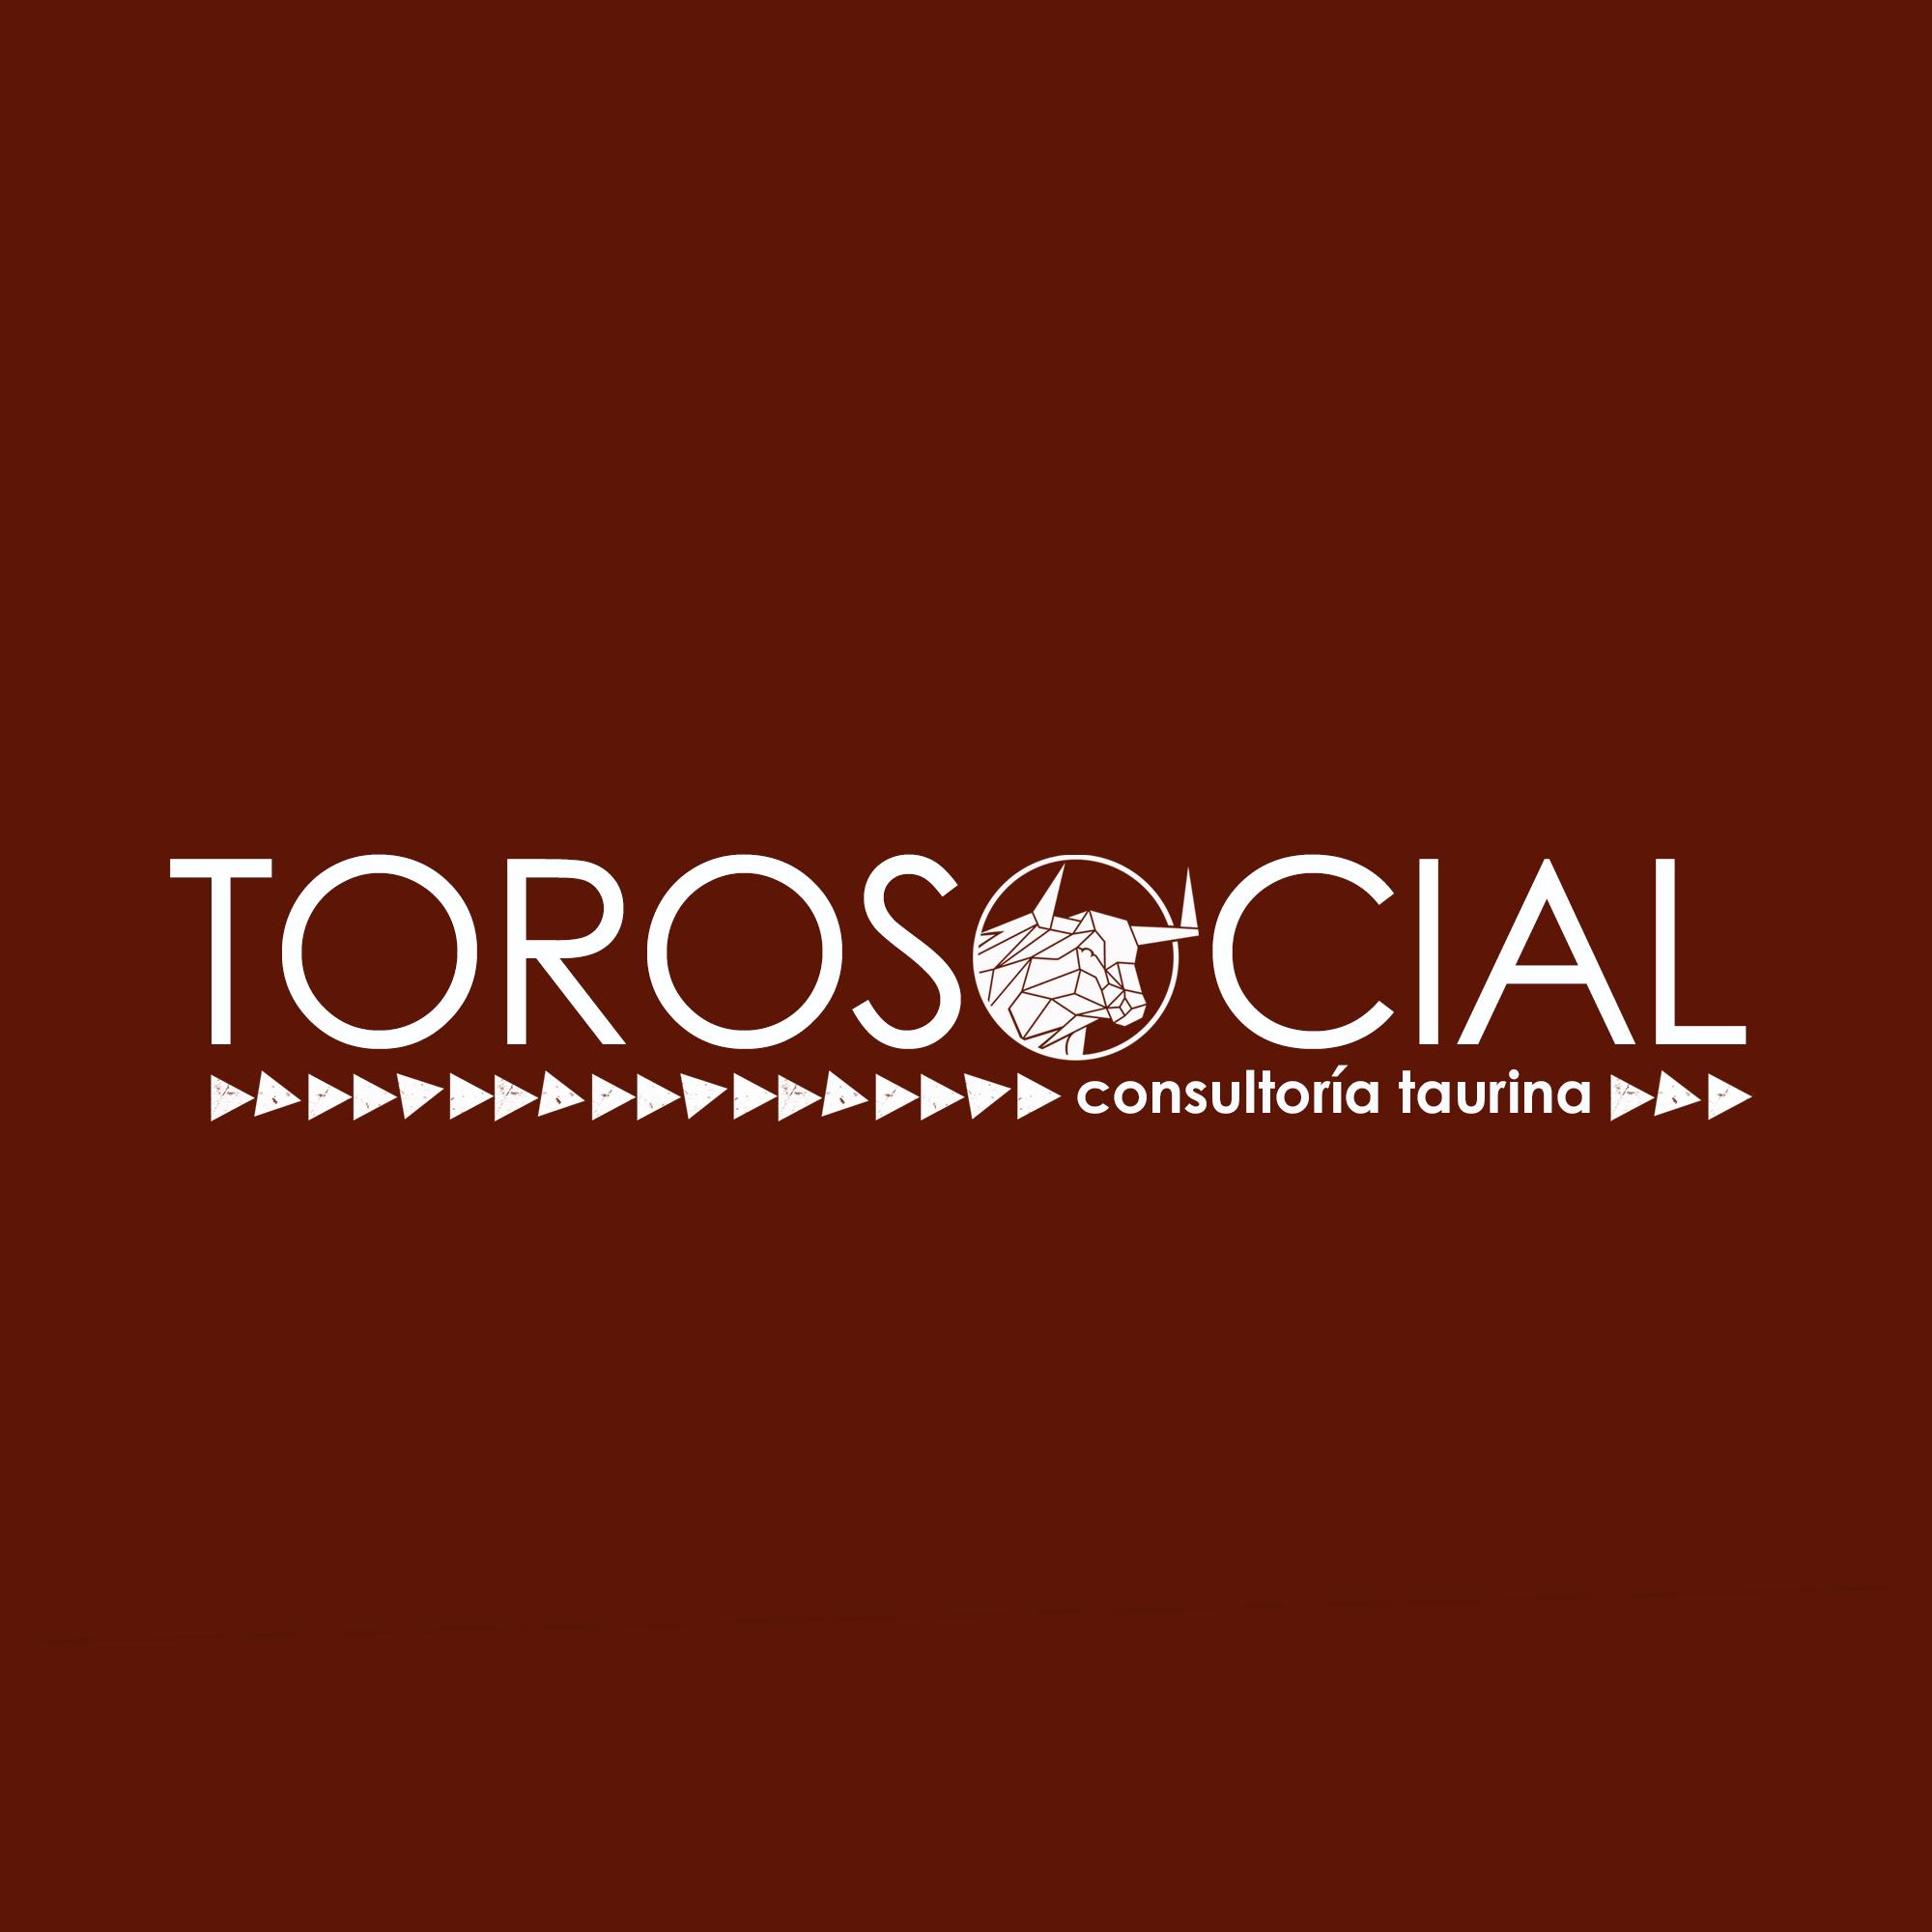 Torosocial 1 1 TOROSOCIAL